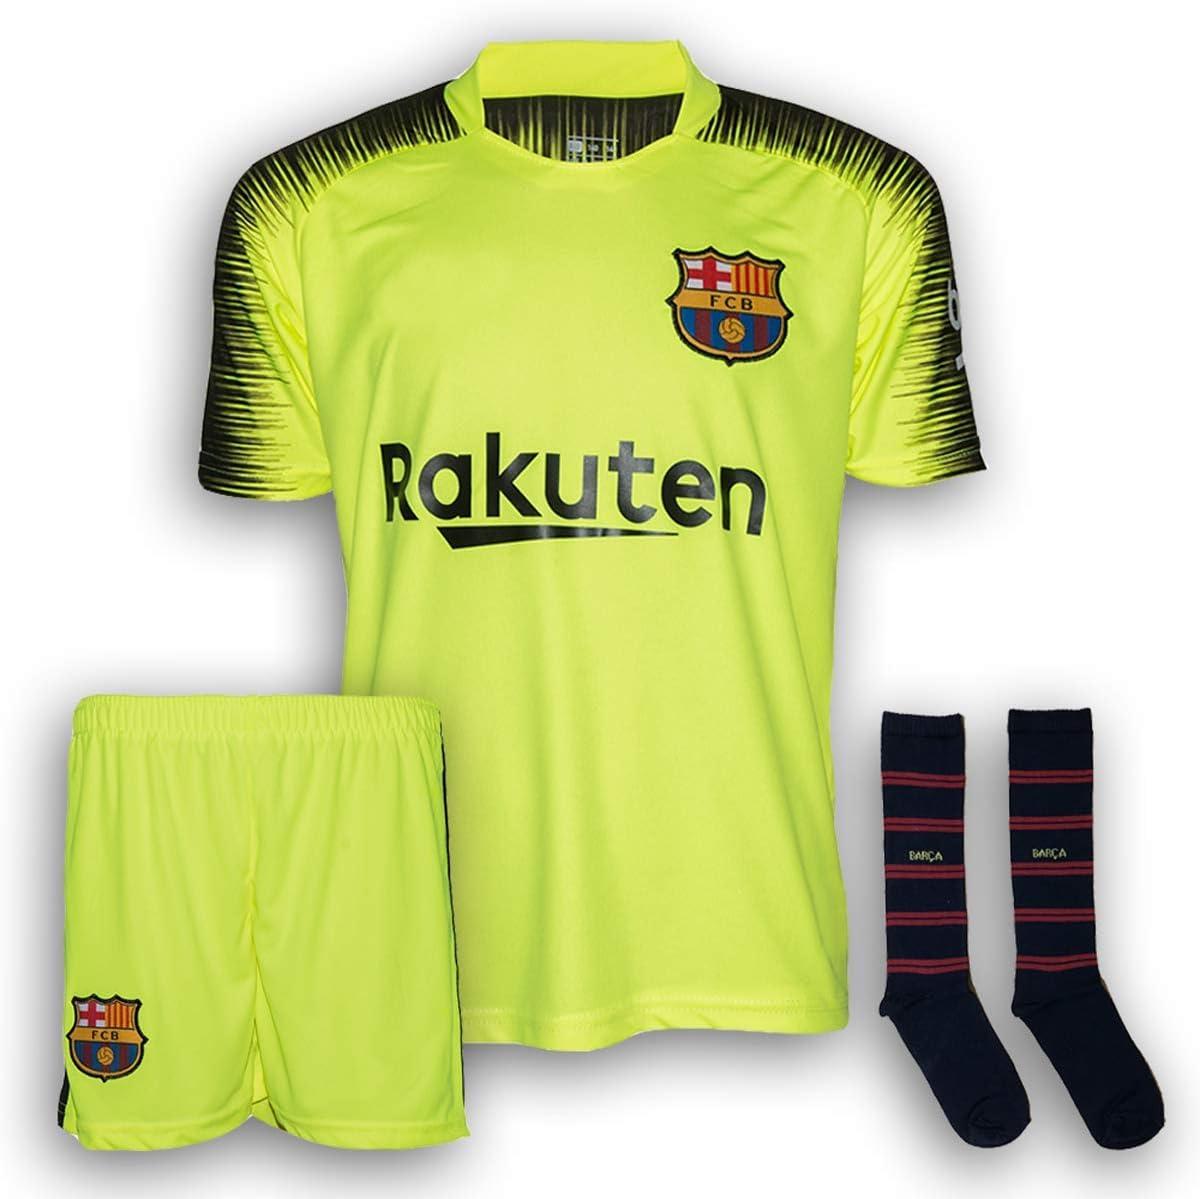 Kit Anpassbar FC Barcelona Kinder Ausw/ärts Trikot und Short Set Offizielles Produkt Replica 2018//2019